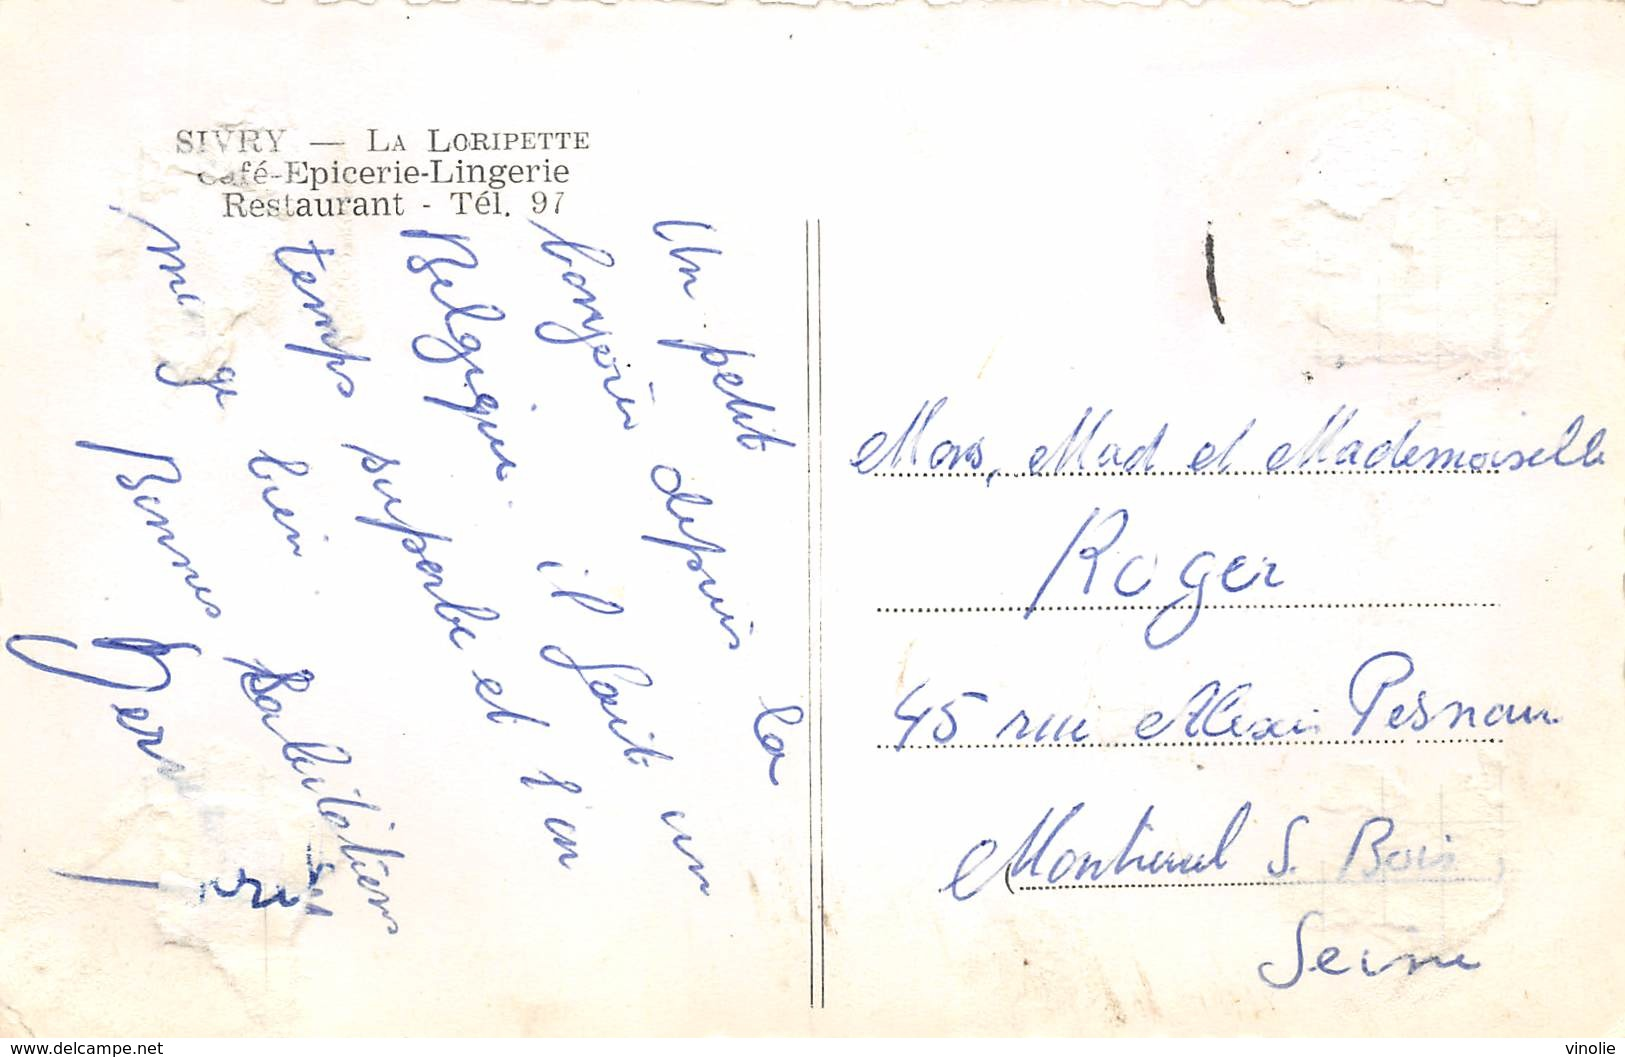 PIE-RO-18-8307 : SIVRY. LA LORIPETTE. CAFE RESTAURANT EPICERIE LINGERIE. - Sivry-Rance